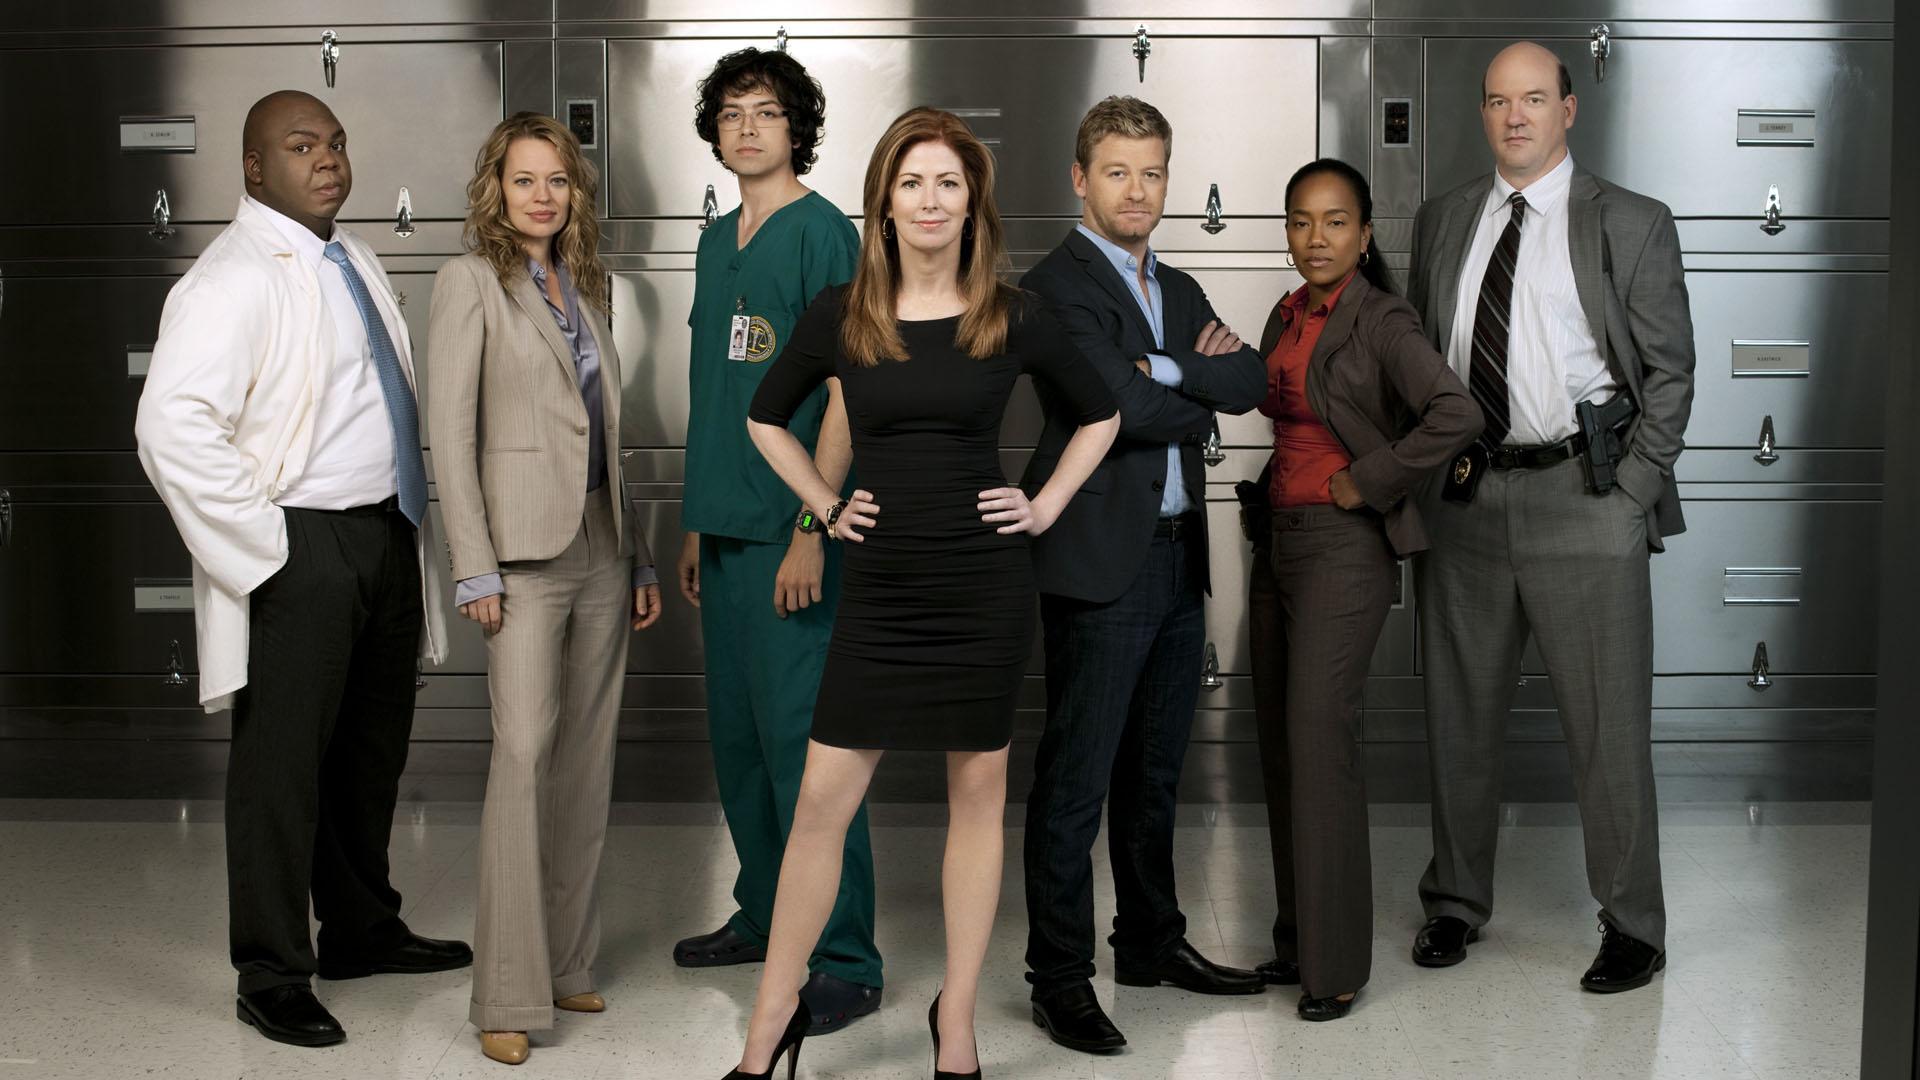 Third season Body of Proof will start February 19th